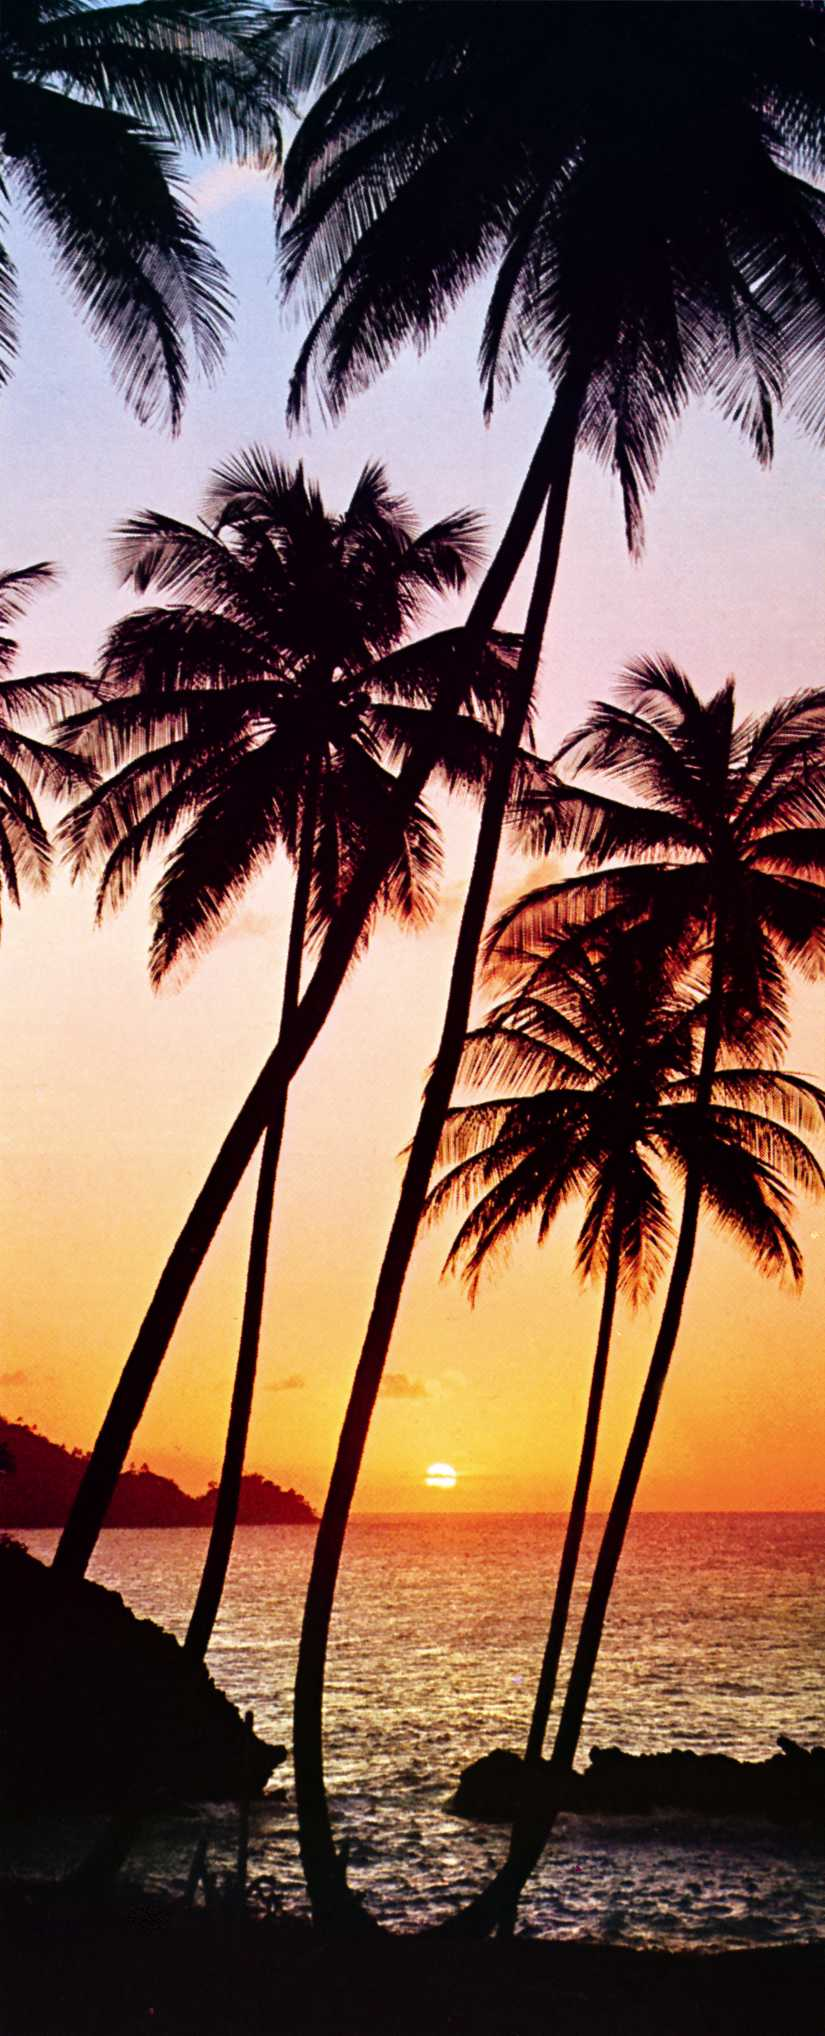 k 39 n 39 k fototapete palmen im sonnenuntergang sunny palms. Black Bedroom Furniture Sets. Home Design Ideas